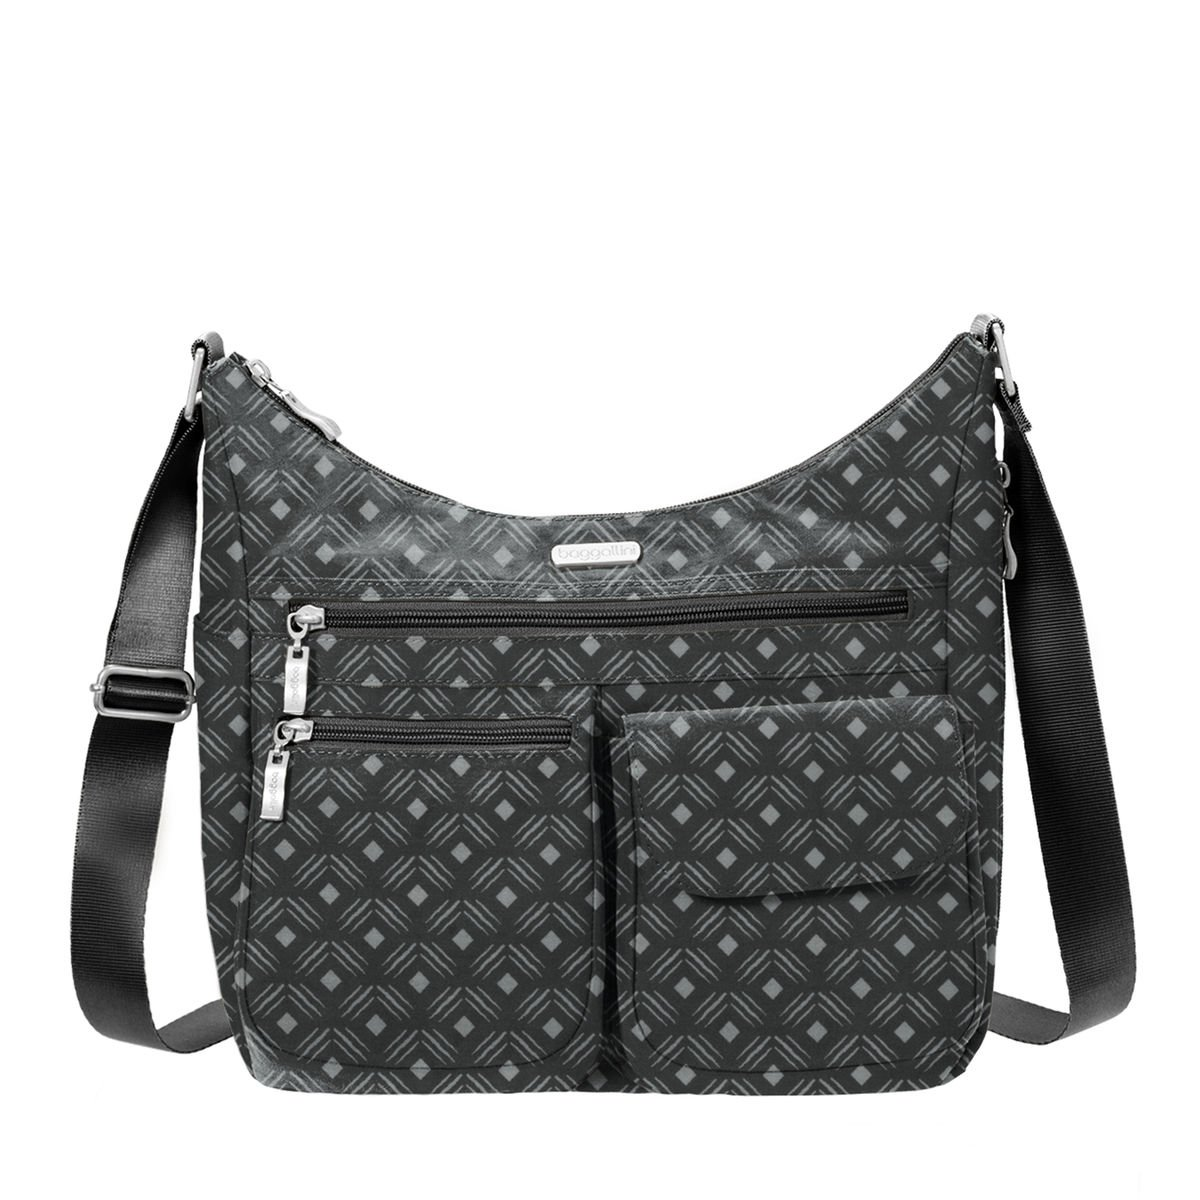 Baggallini Everywhere Travel Crossbody Bag, Black Diamond